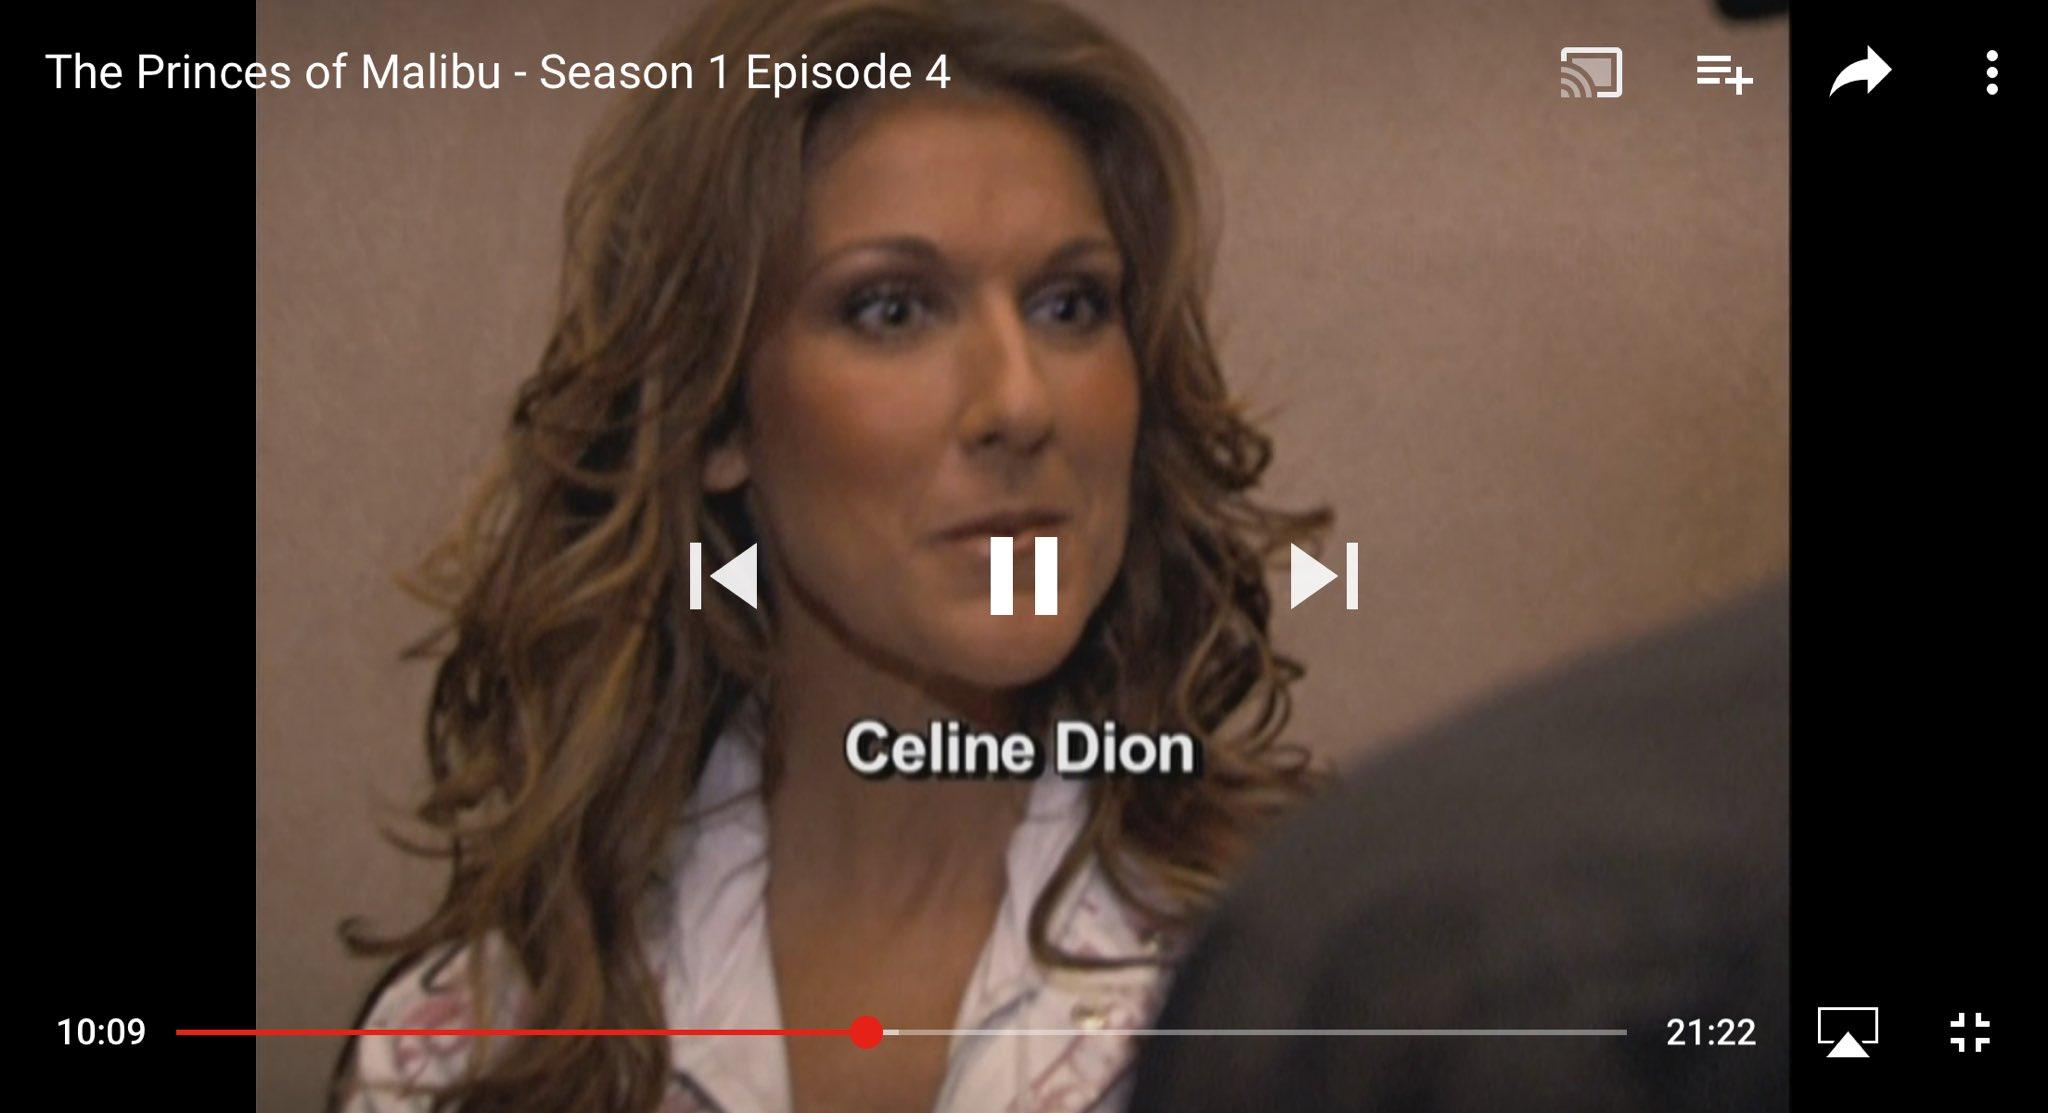 My fav #Celine moment https://t.co/rhVt5KZ26U